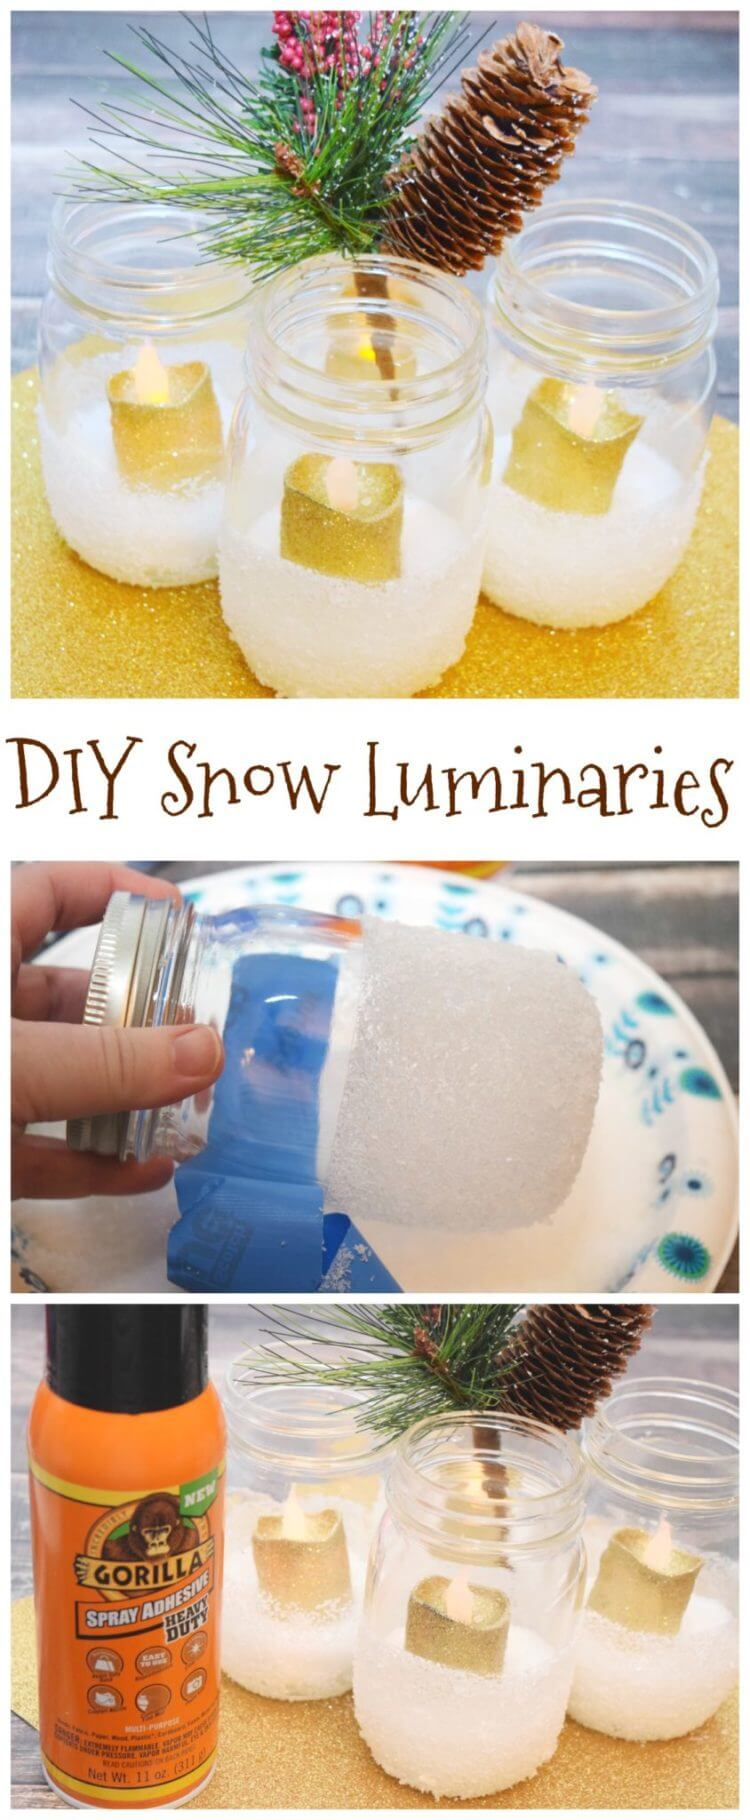 Make DIY Snow Luminaries for your holiday table or mantle! #ad #GorillaTough @GorillaGlue